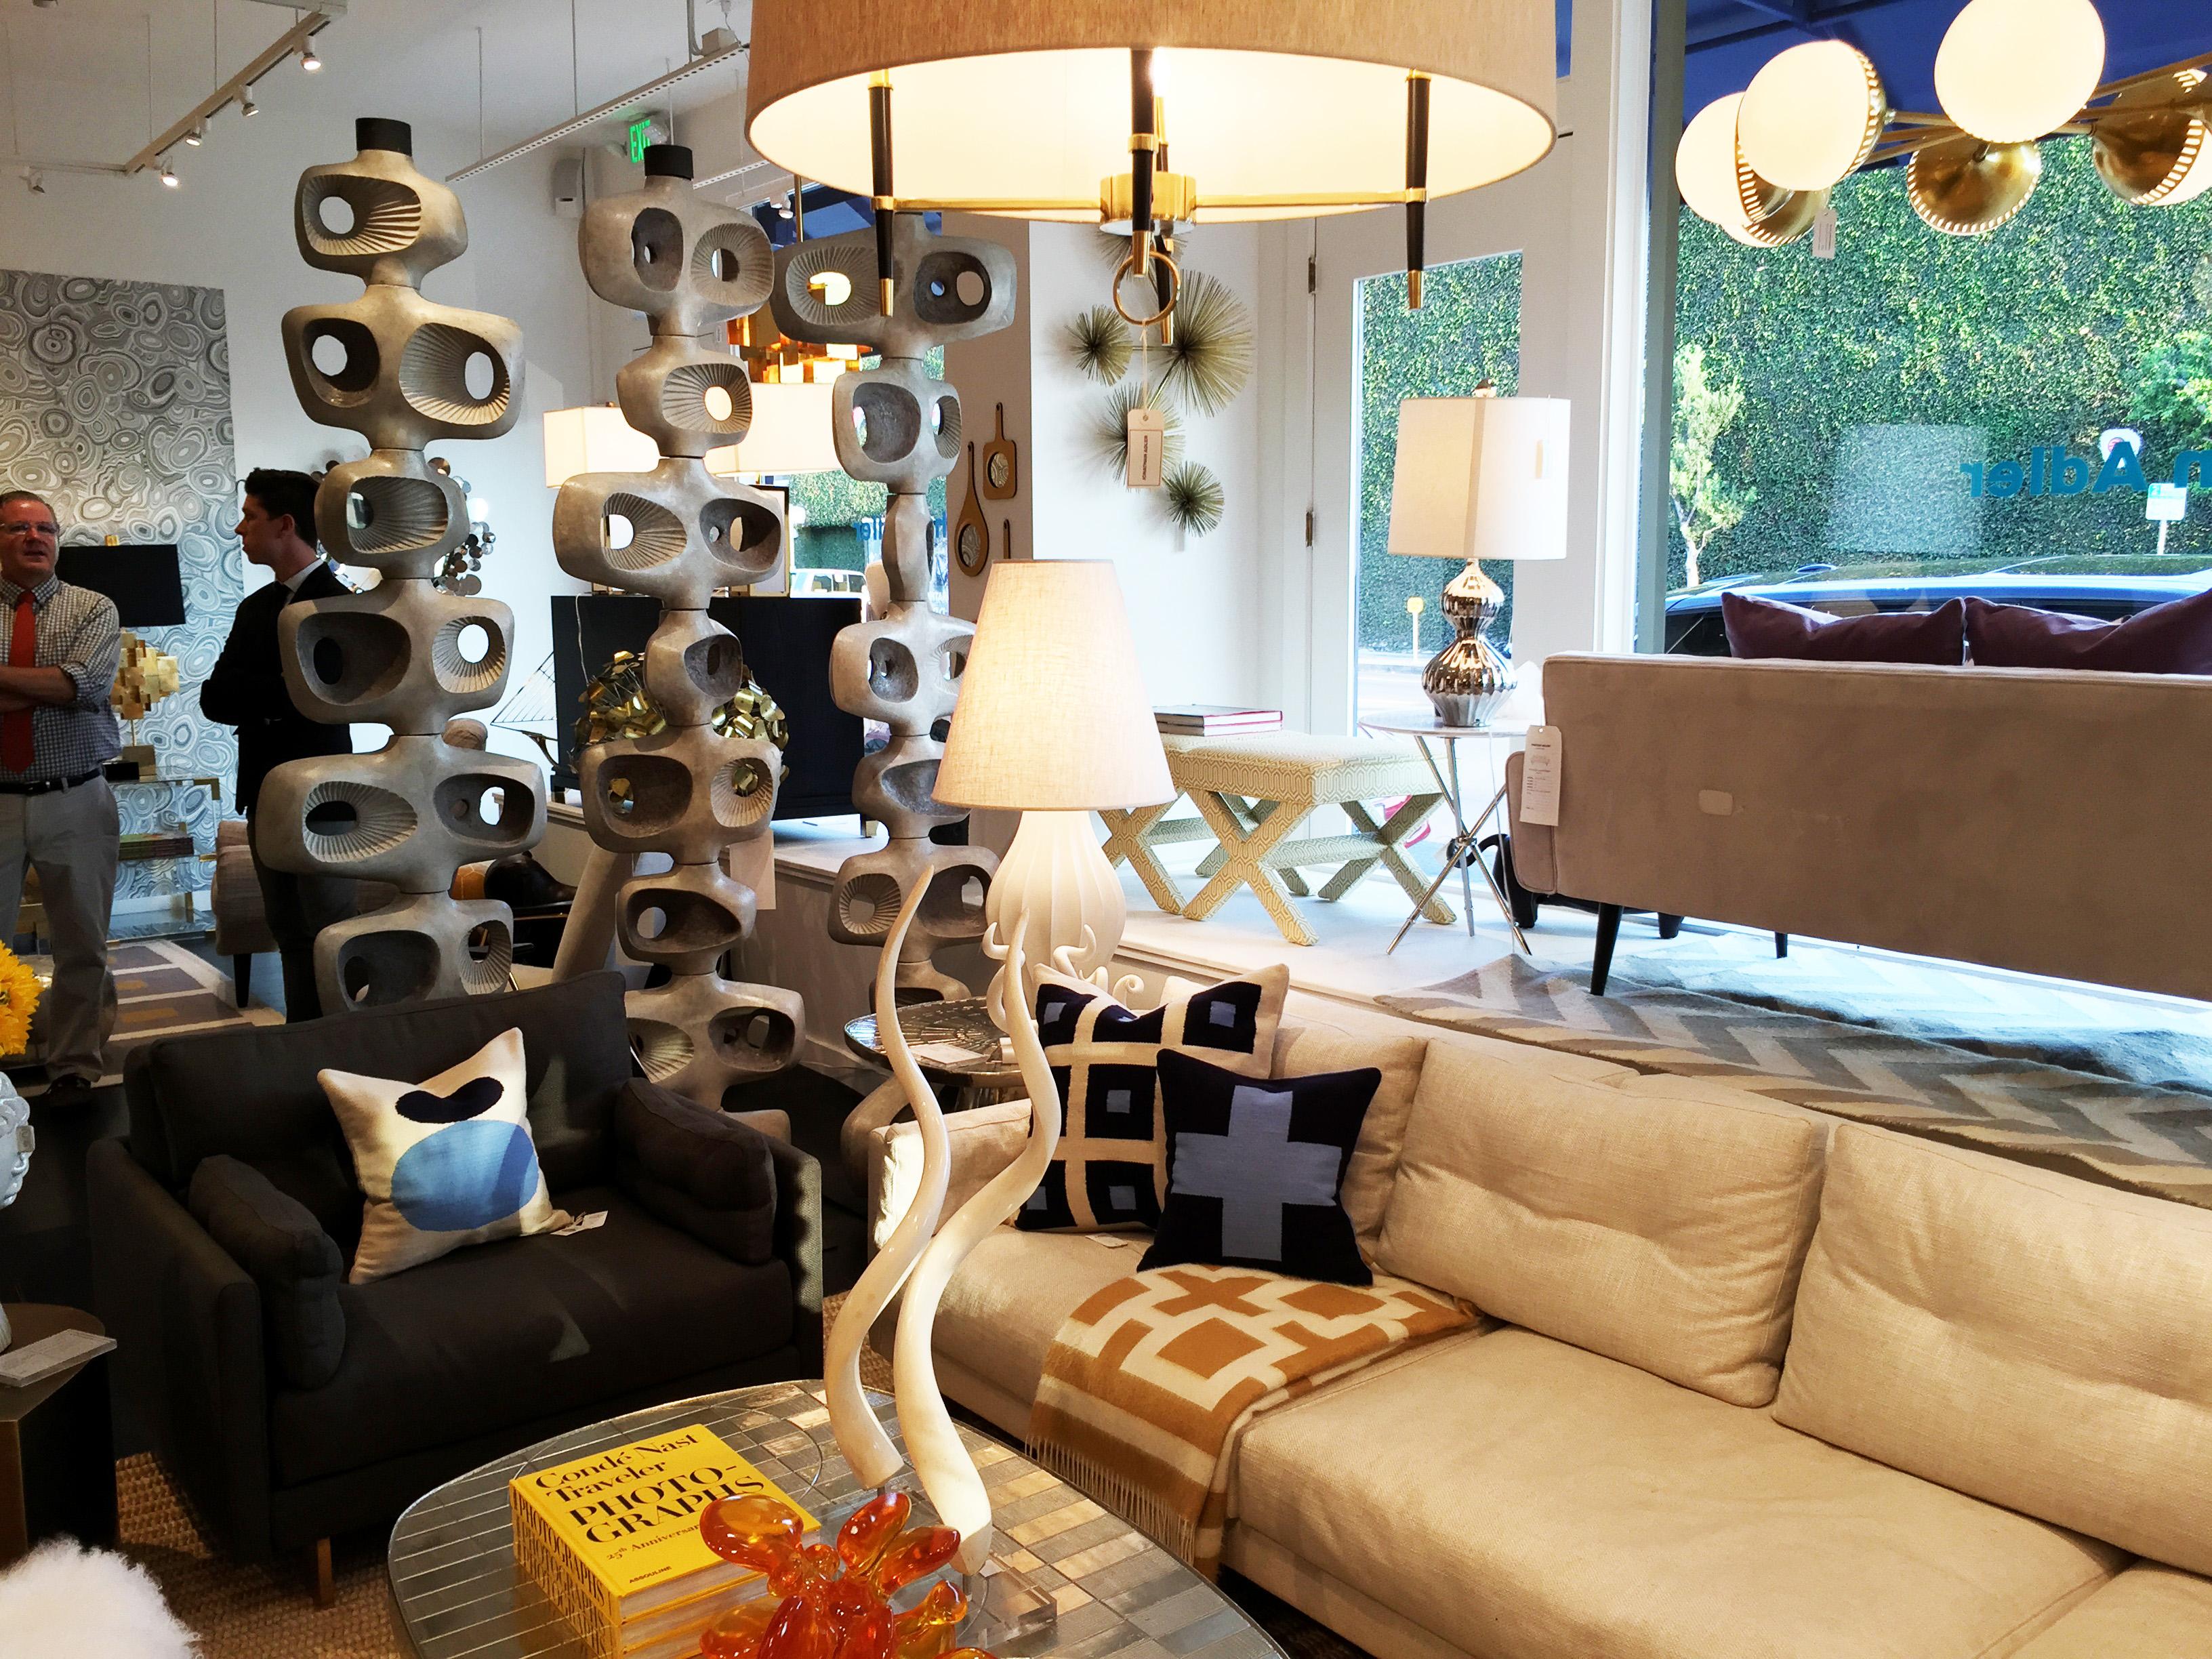 Hamptons to Hollywood meets Jonathan Adler by Kyle Langan